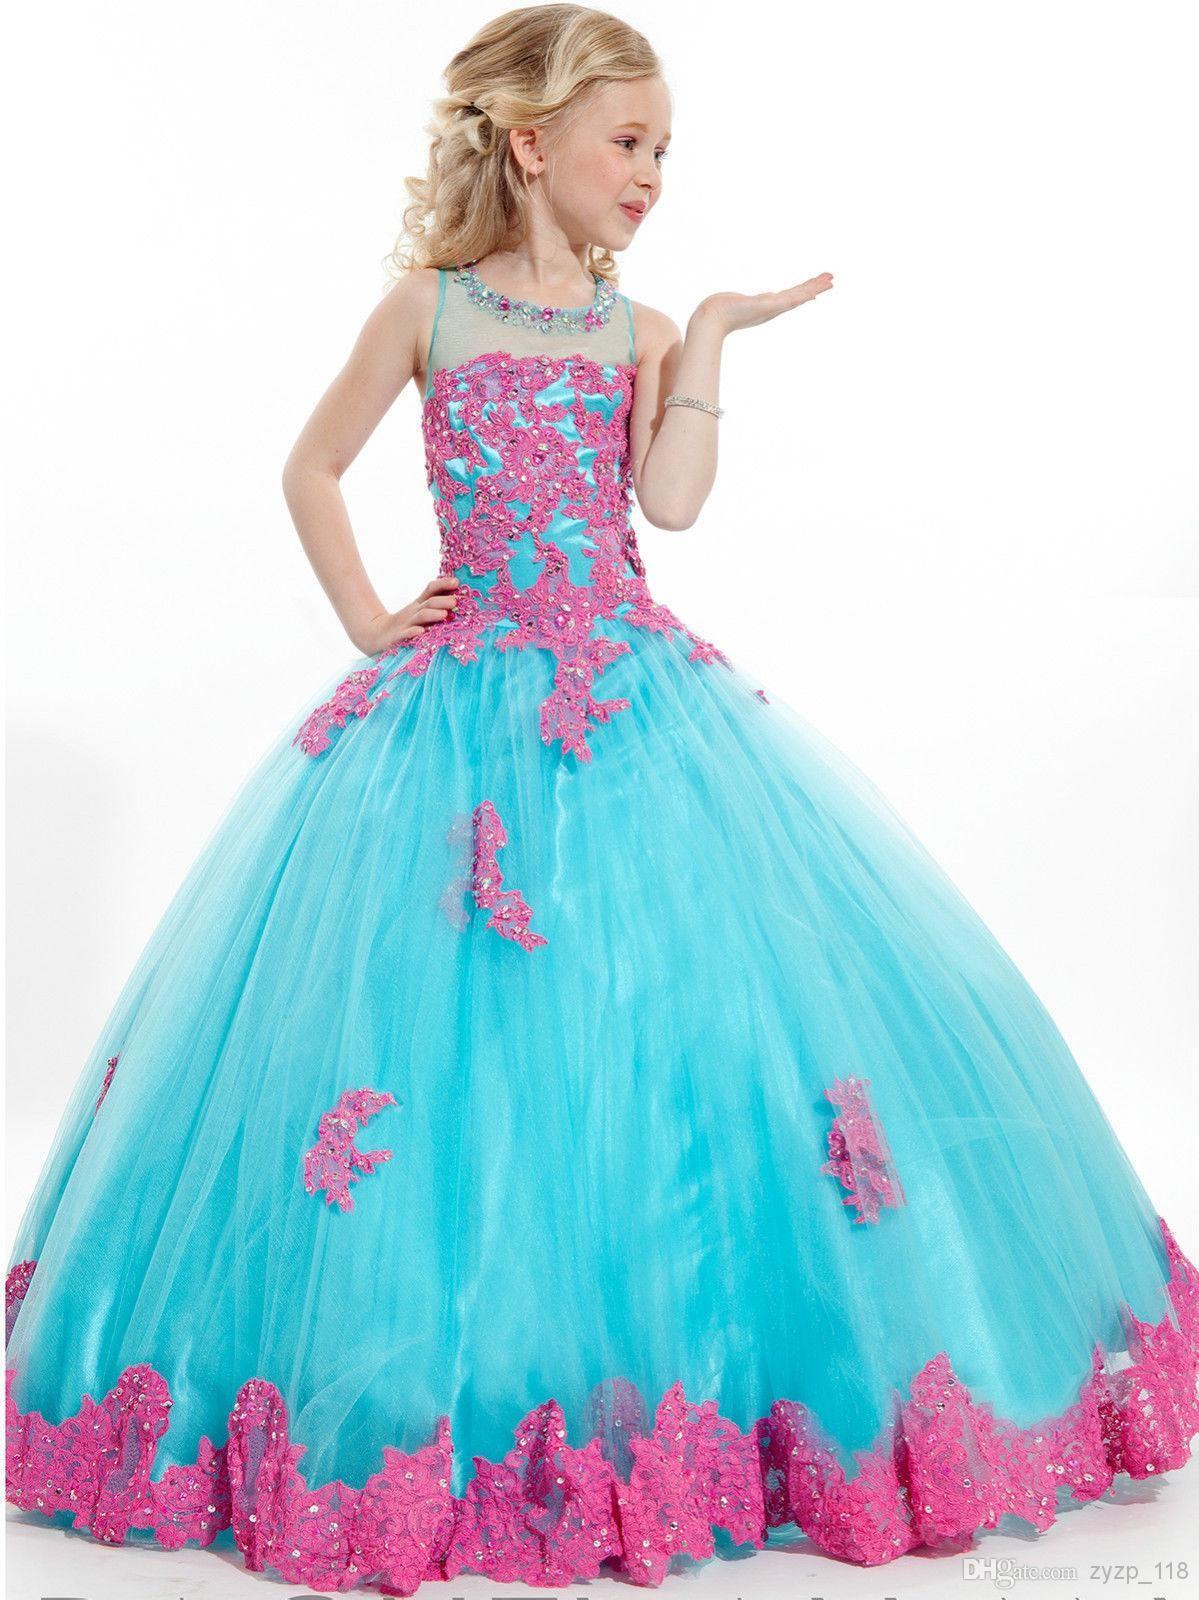 dresses for girls age 10 - Google Search | girl stuff | Pinterest ...